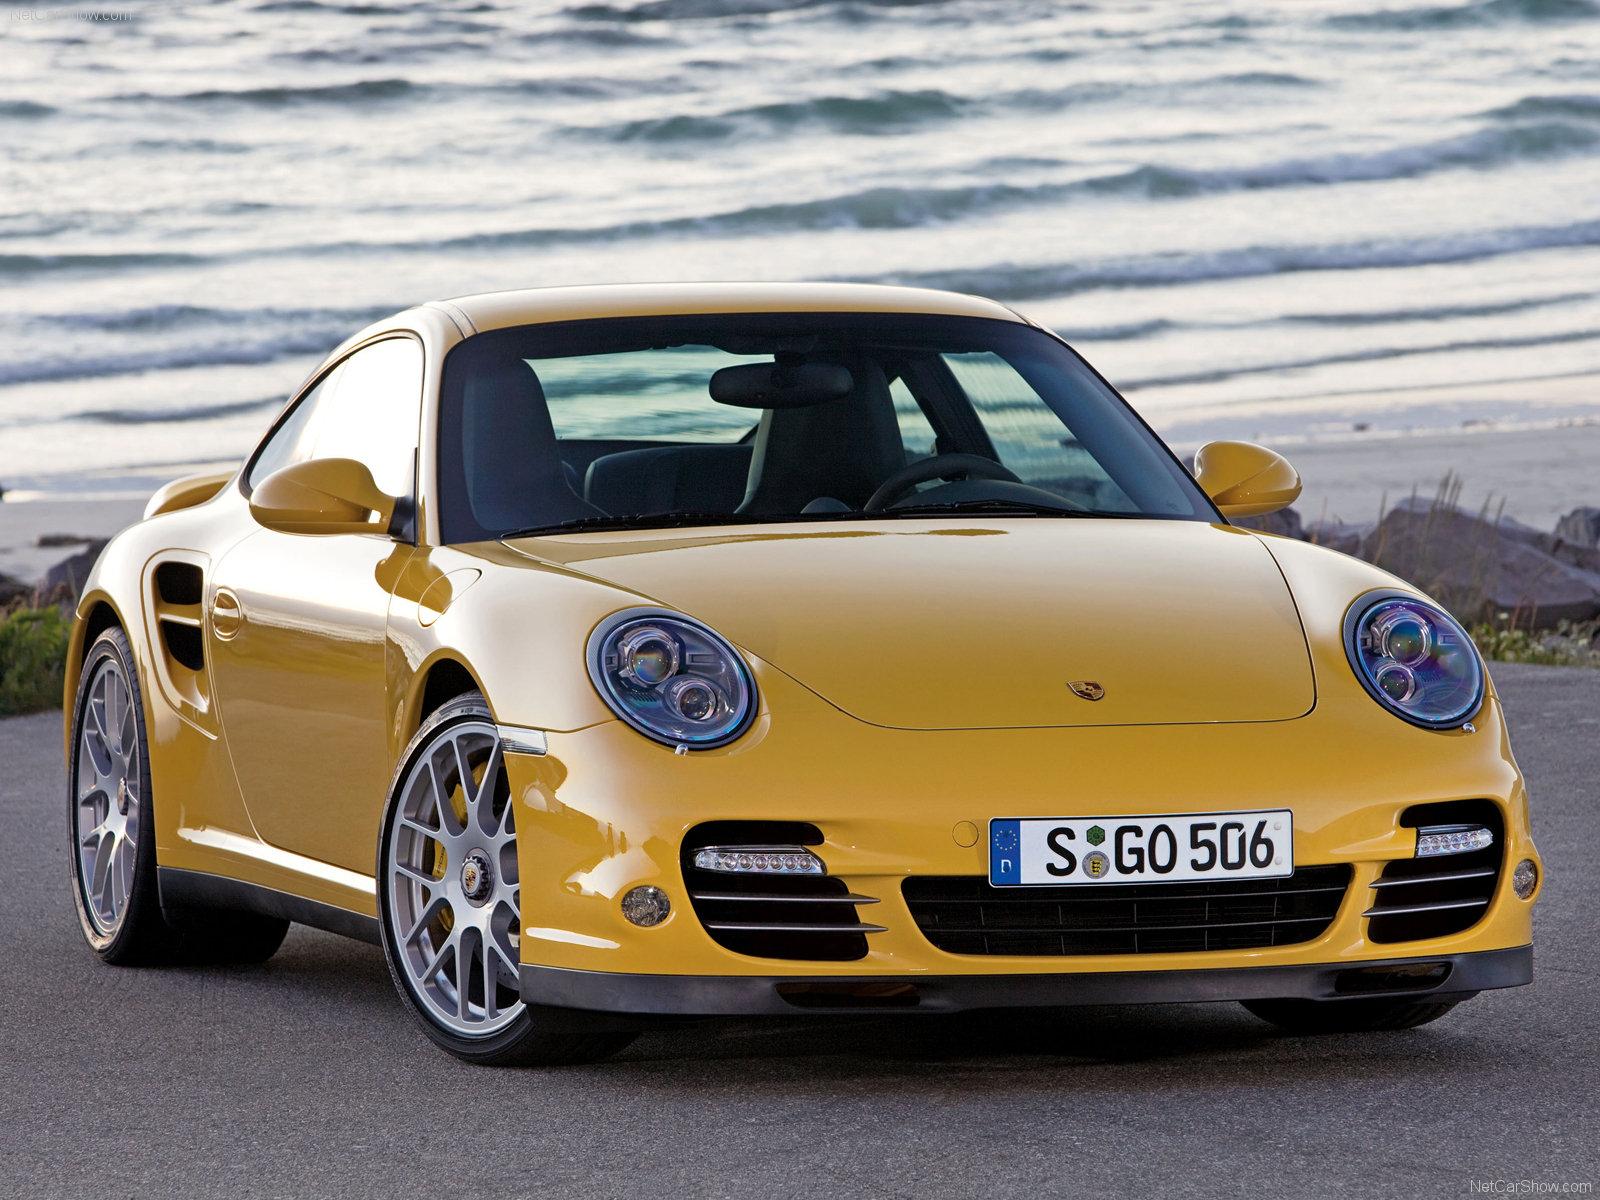 2010 yellow porsche 911 turbo wallpapers. Black Bedroom Furniture Sets. Home Design Ideas